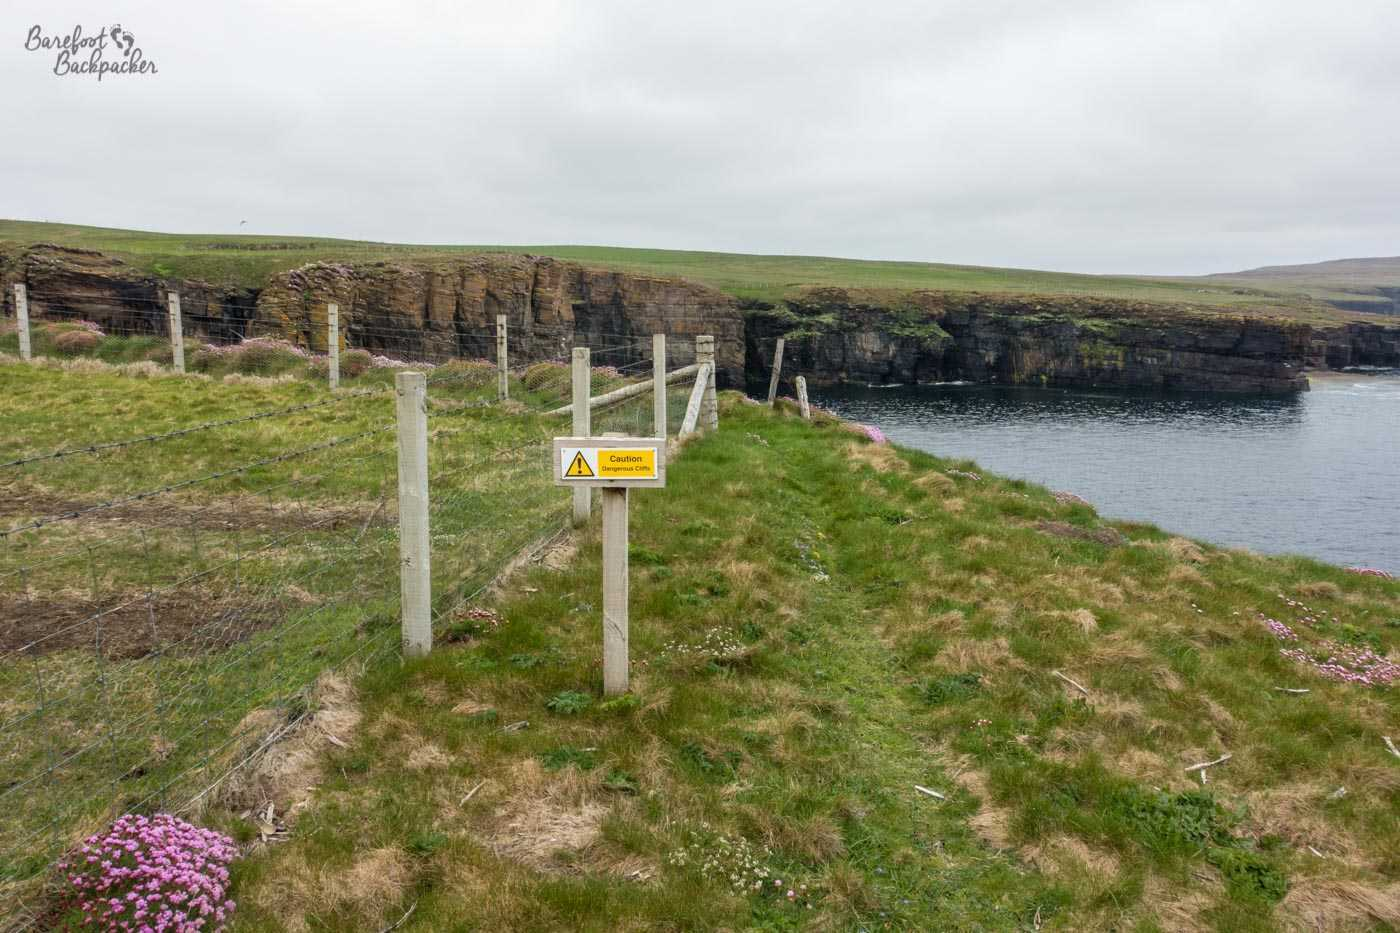 A small signpost saying